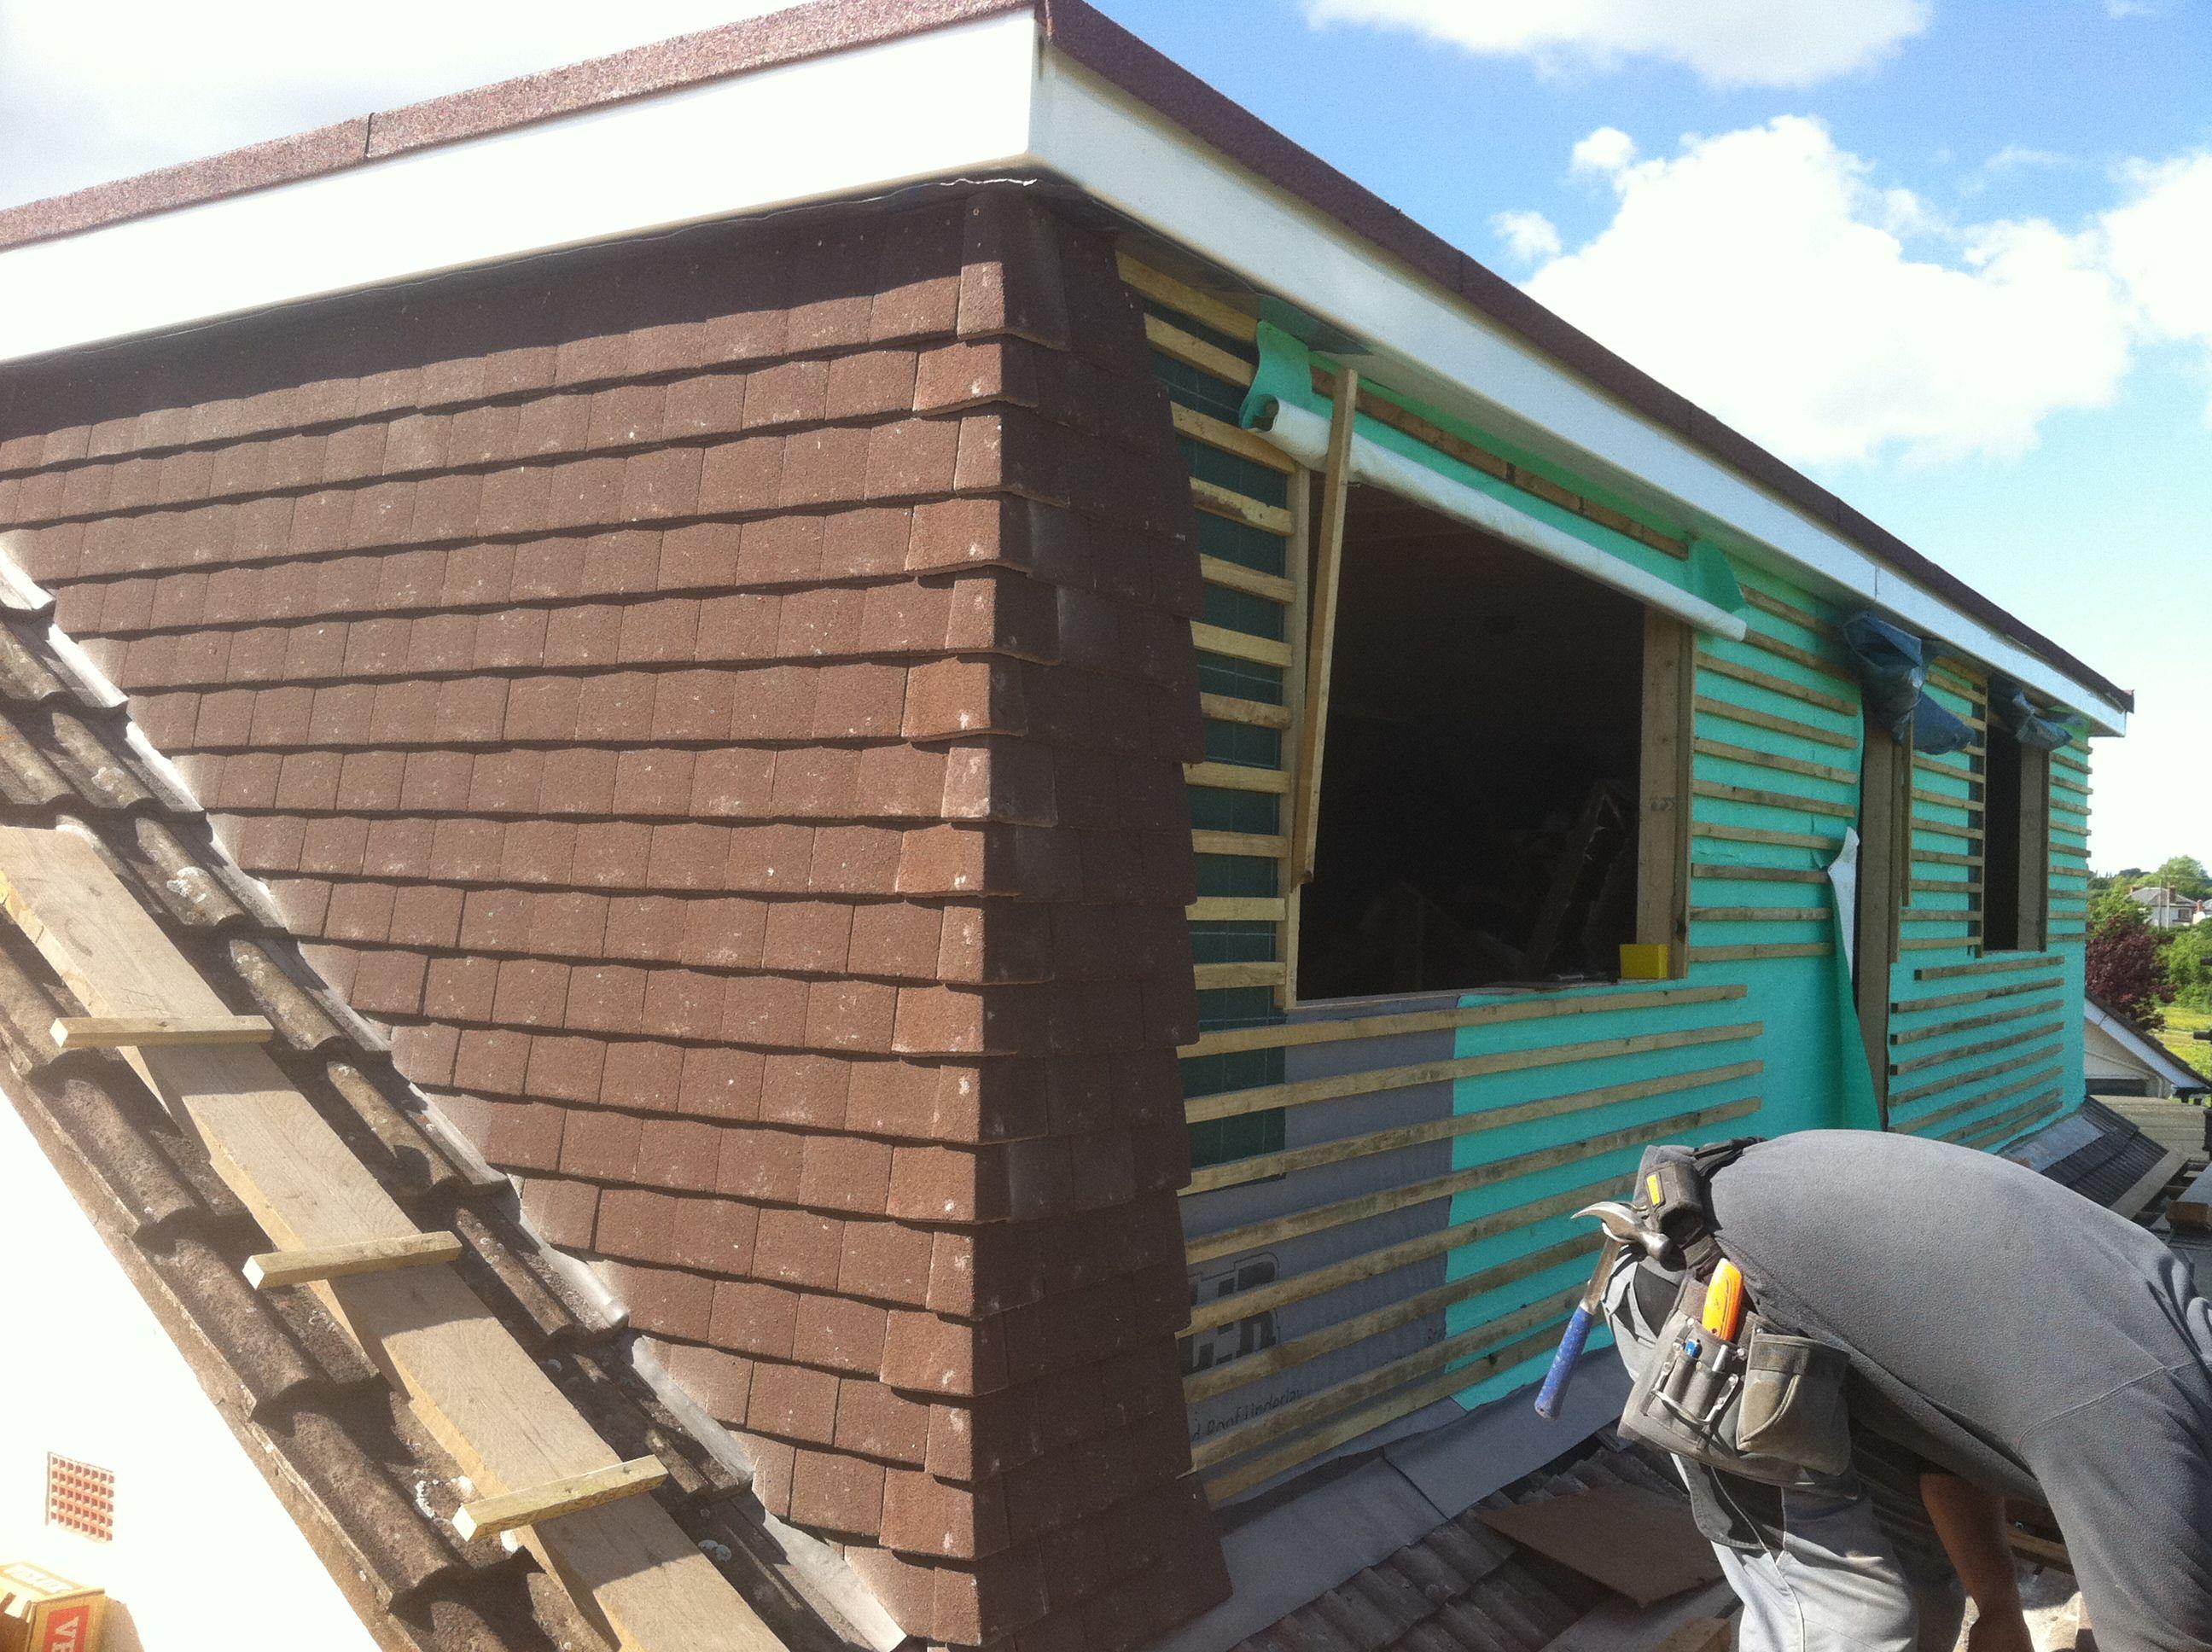 Loft Conversion Flat Roof Dormer In Build 7 Loft Conversion Flat Roof Loft Conversion Attic Loft